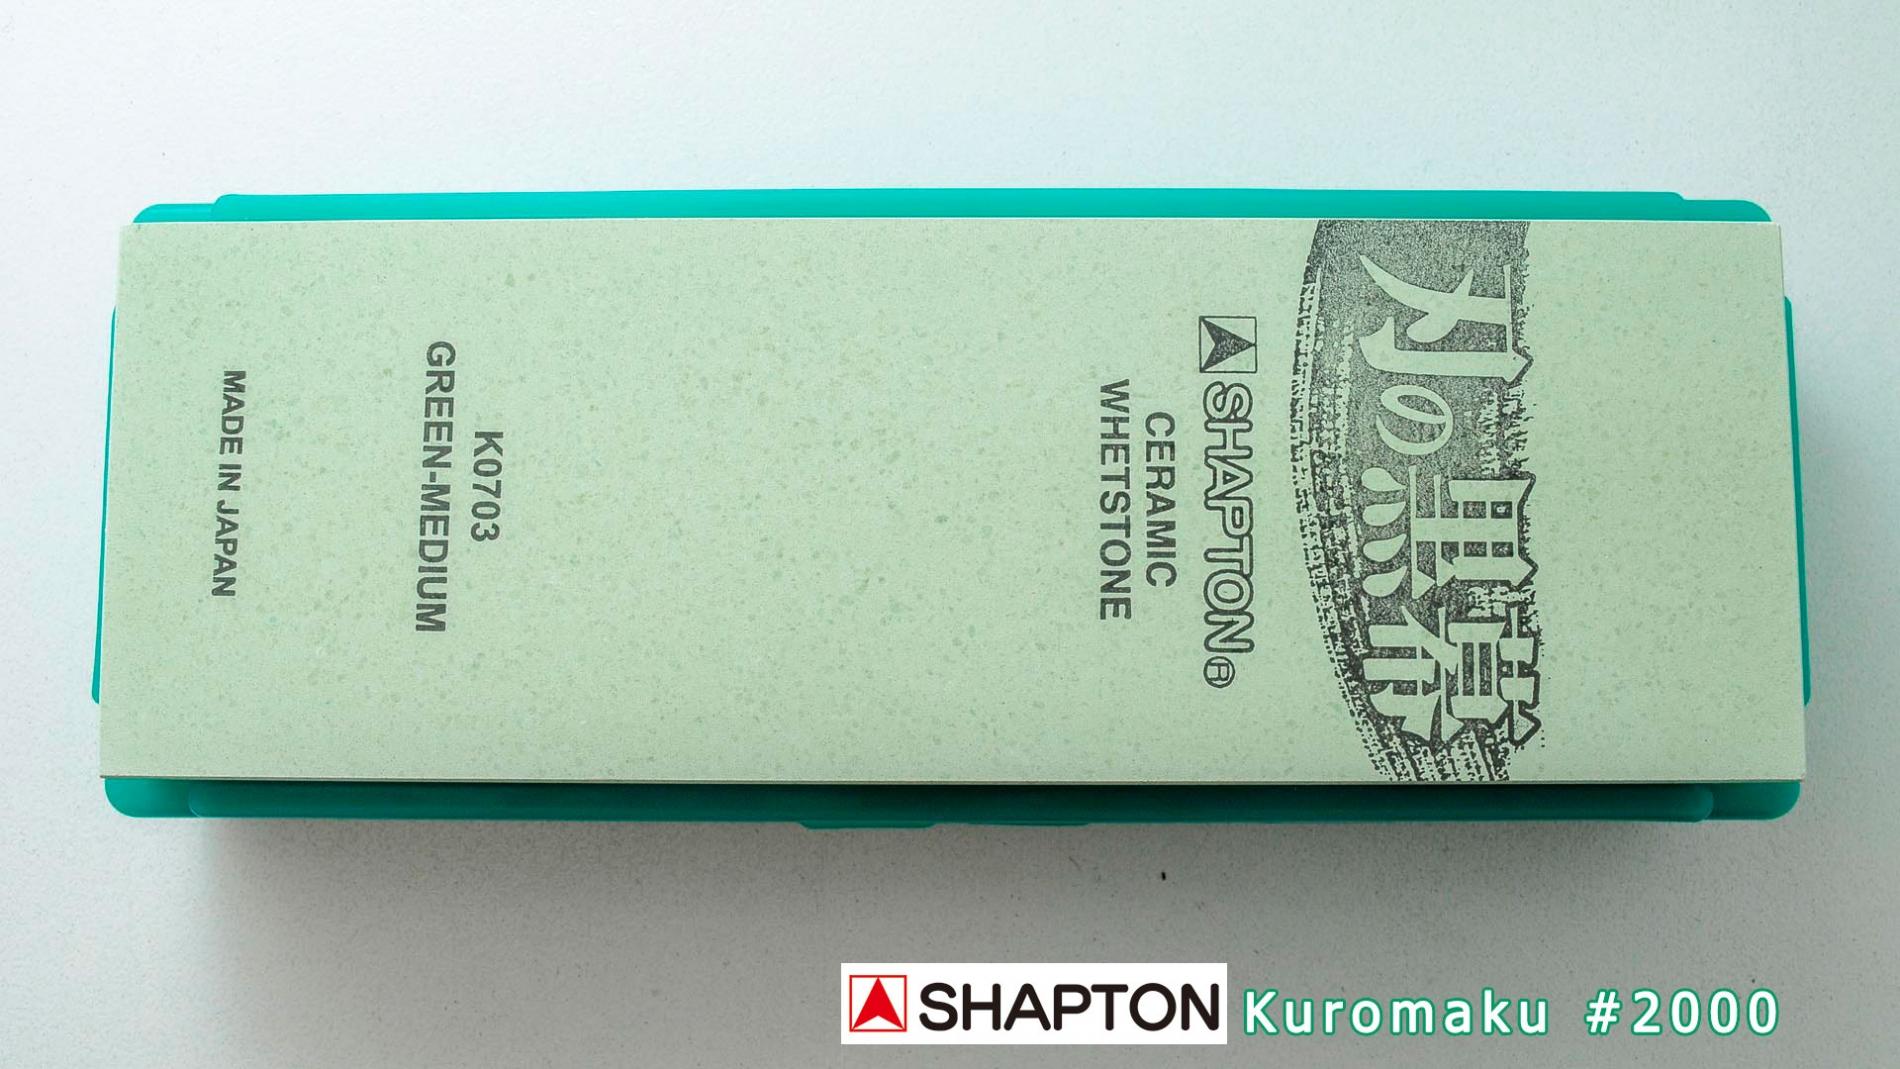 K0703-Piedra de asentar 2000 Shapton Kuromaku K0703-max-4.